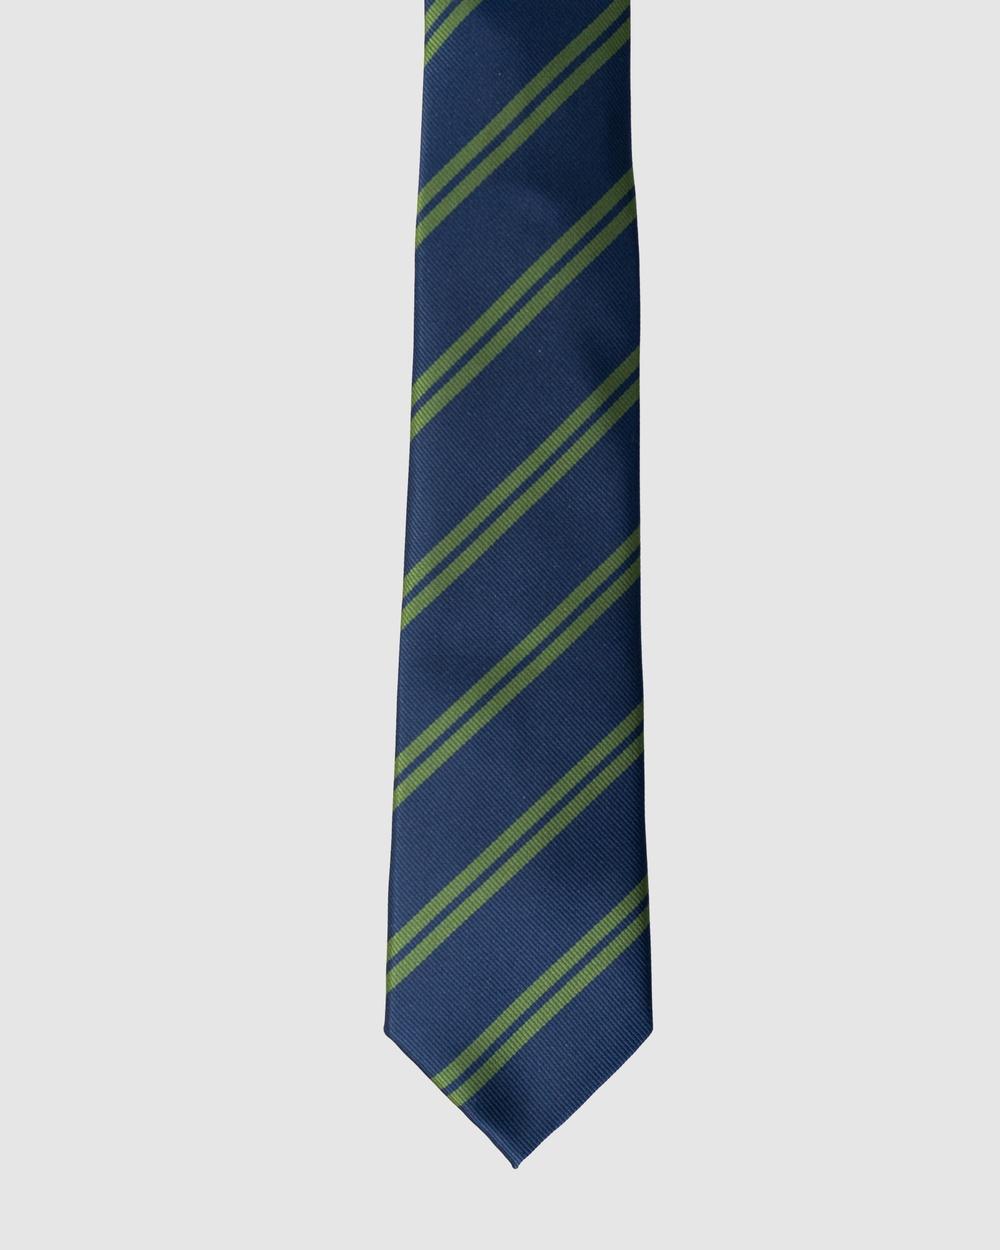 RUMI Stripe Navy & Green Necktie Ties Navy Australia